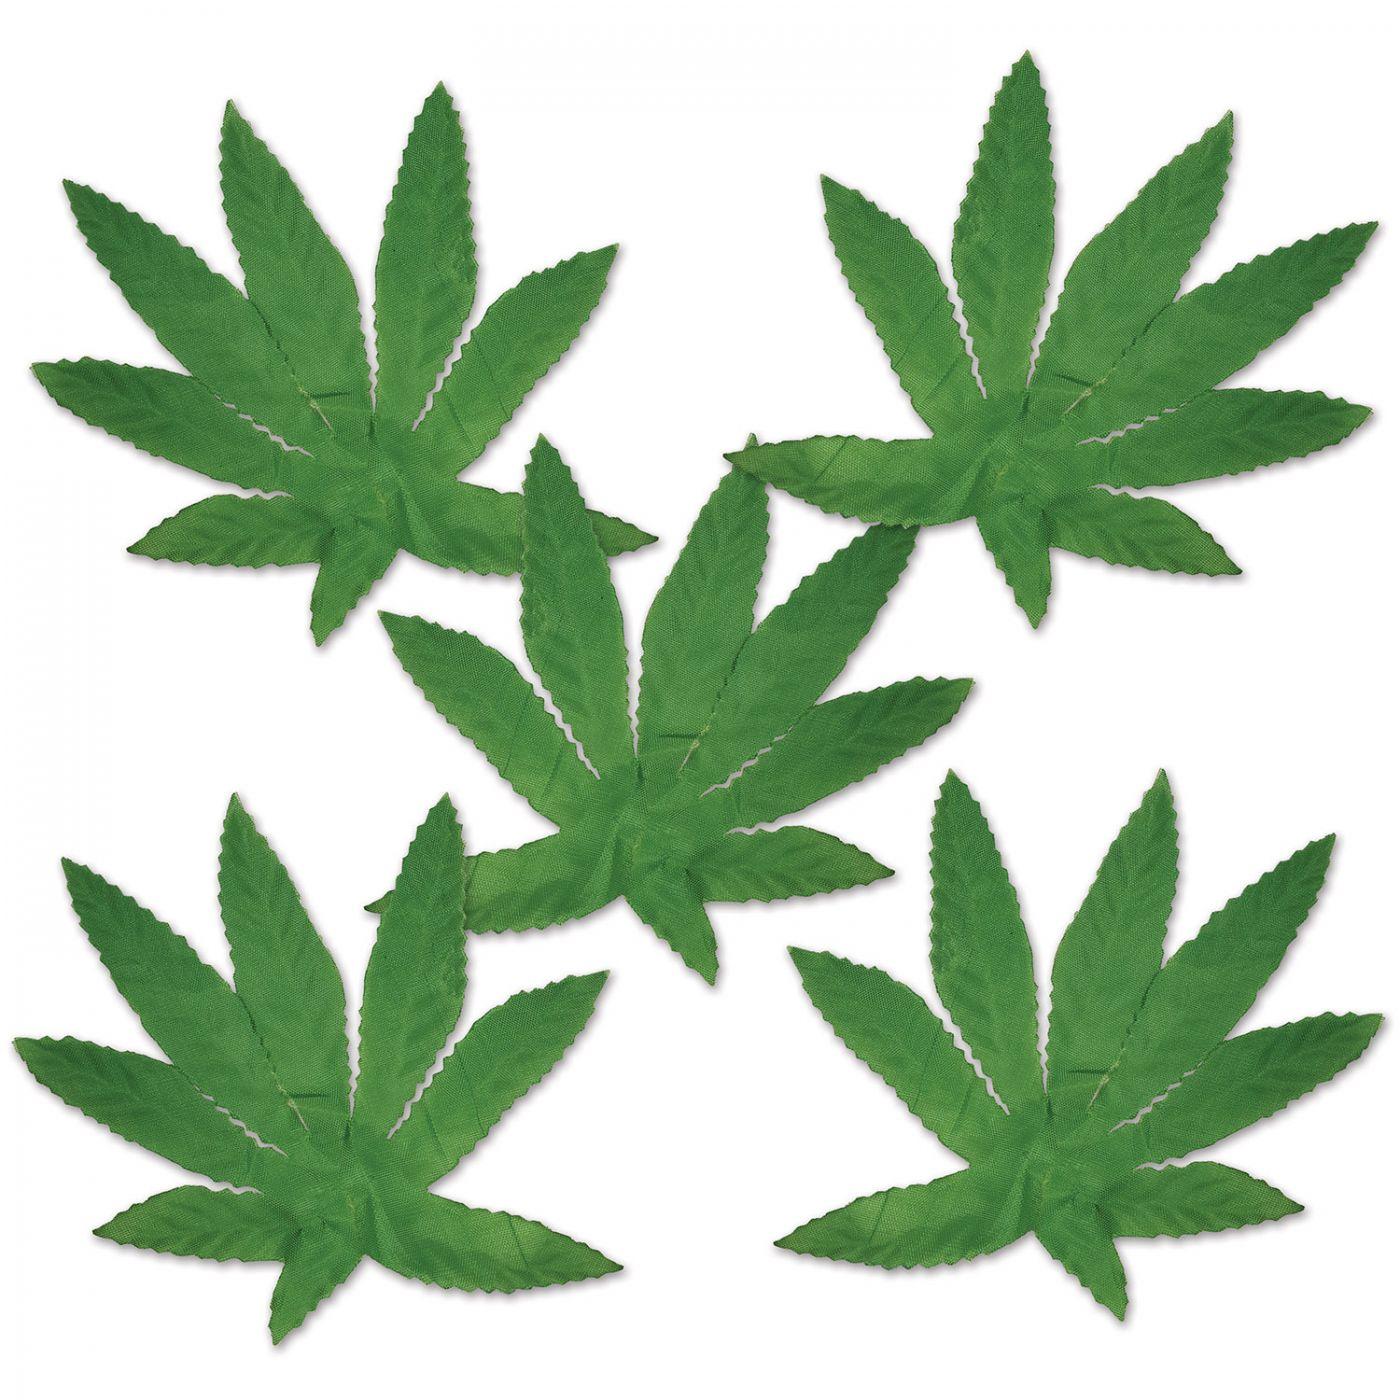 Tropical Fern Leaves (24) image